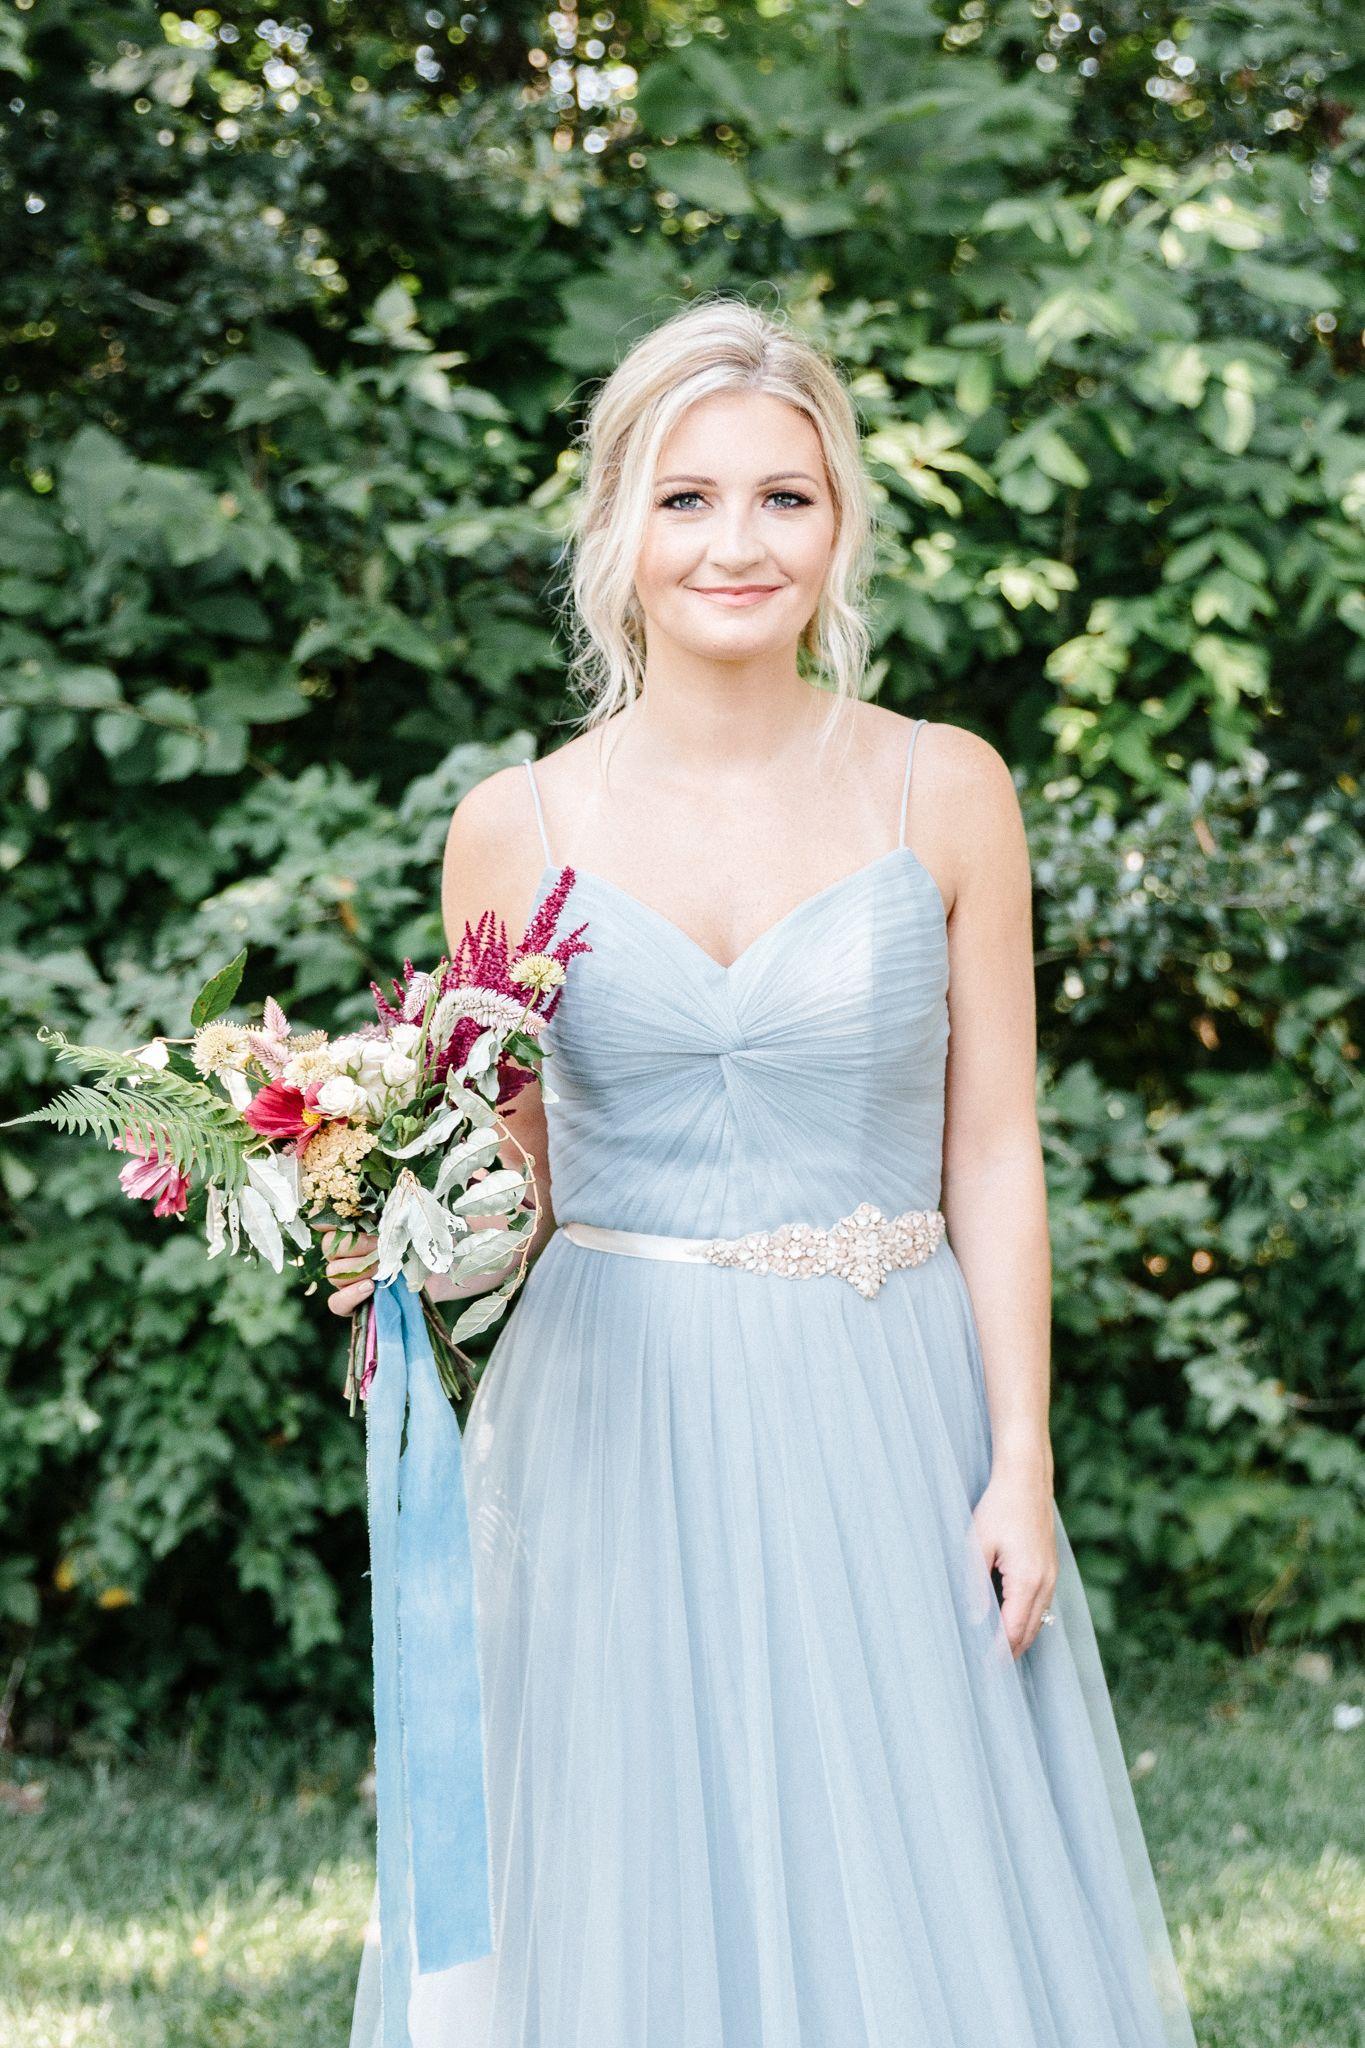 Organic Sunset Styled Wedding Shoot. Dusty Blue Fall